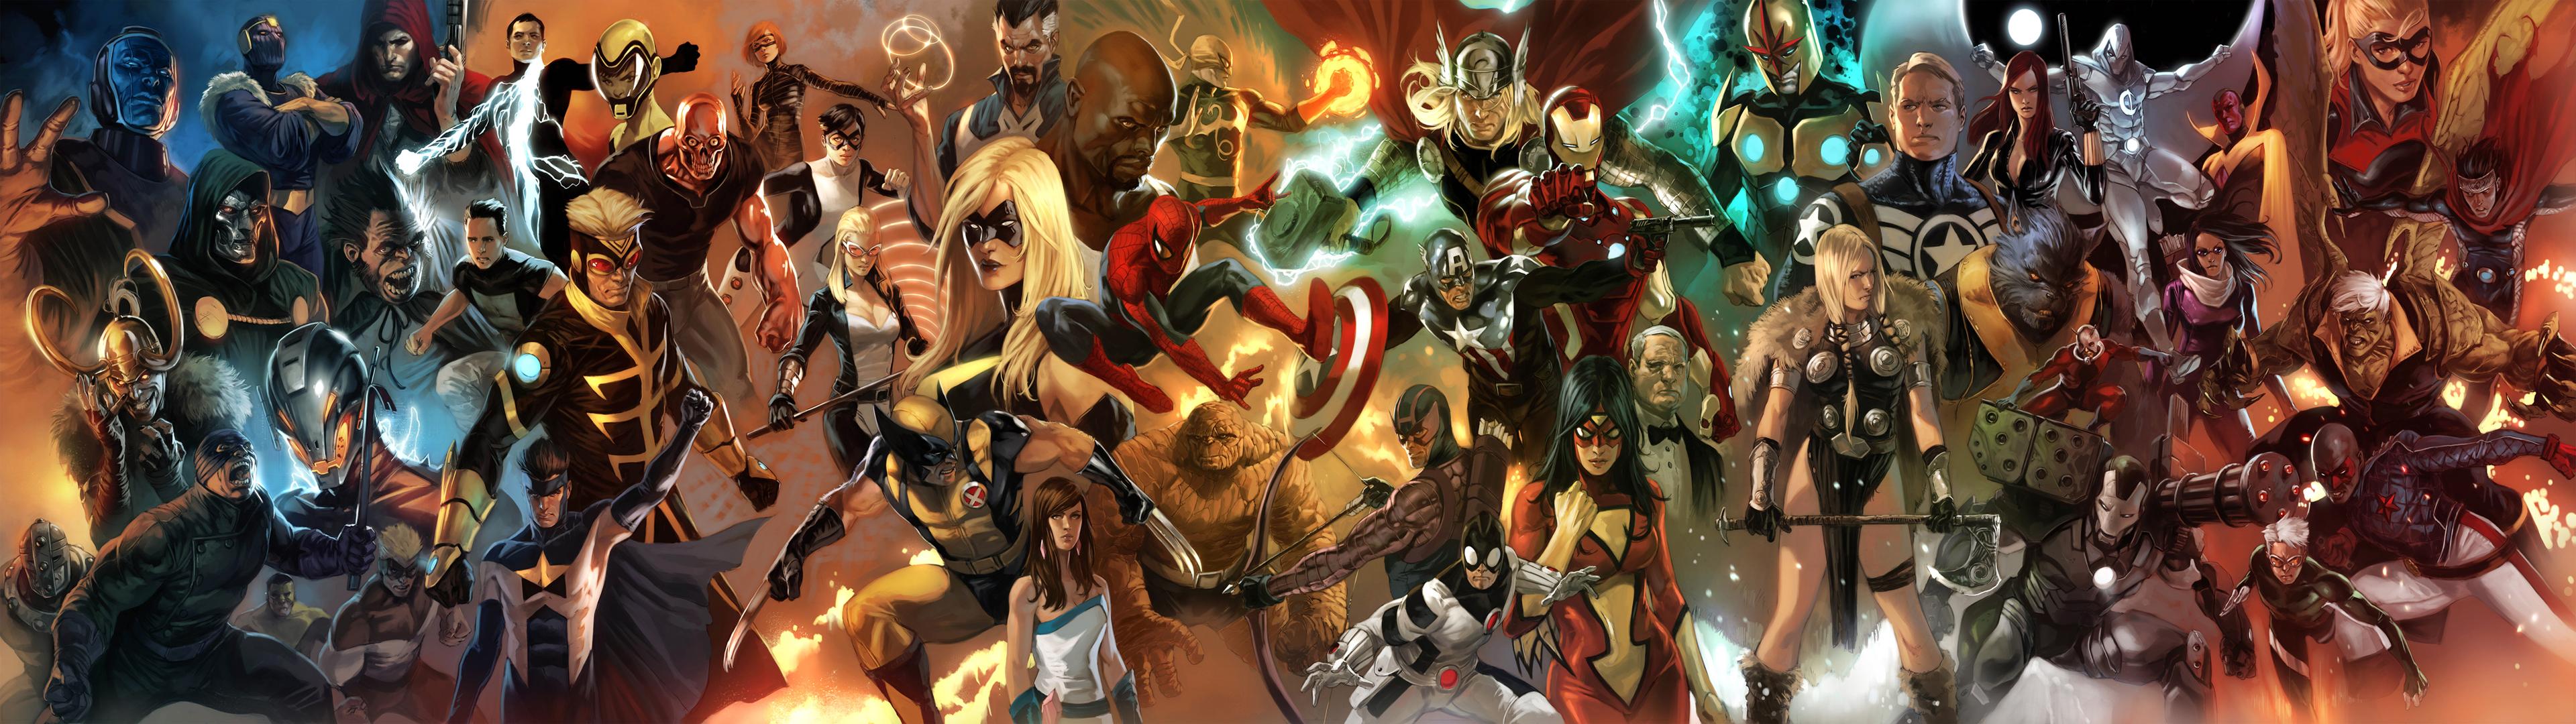 General-x1080-dual-monitors-multiple-display-Marvel-Comics-comics-Spider-Man-Dr-Doom-Wolverine-wallpaper-wp3805876